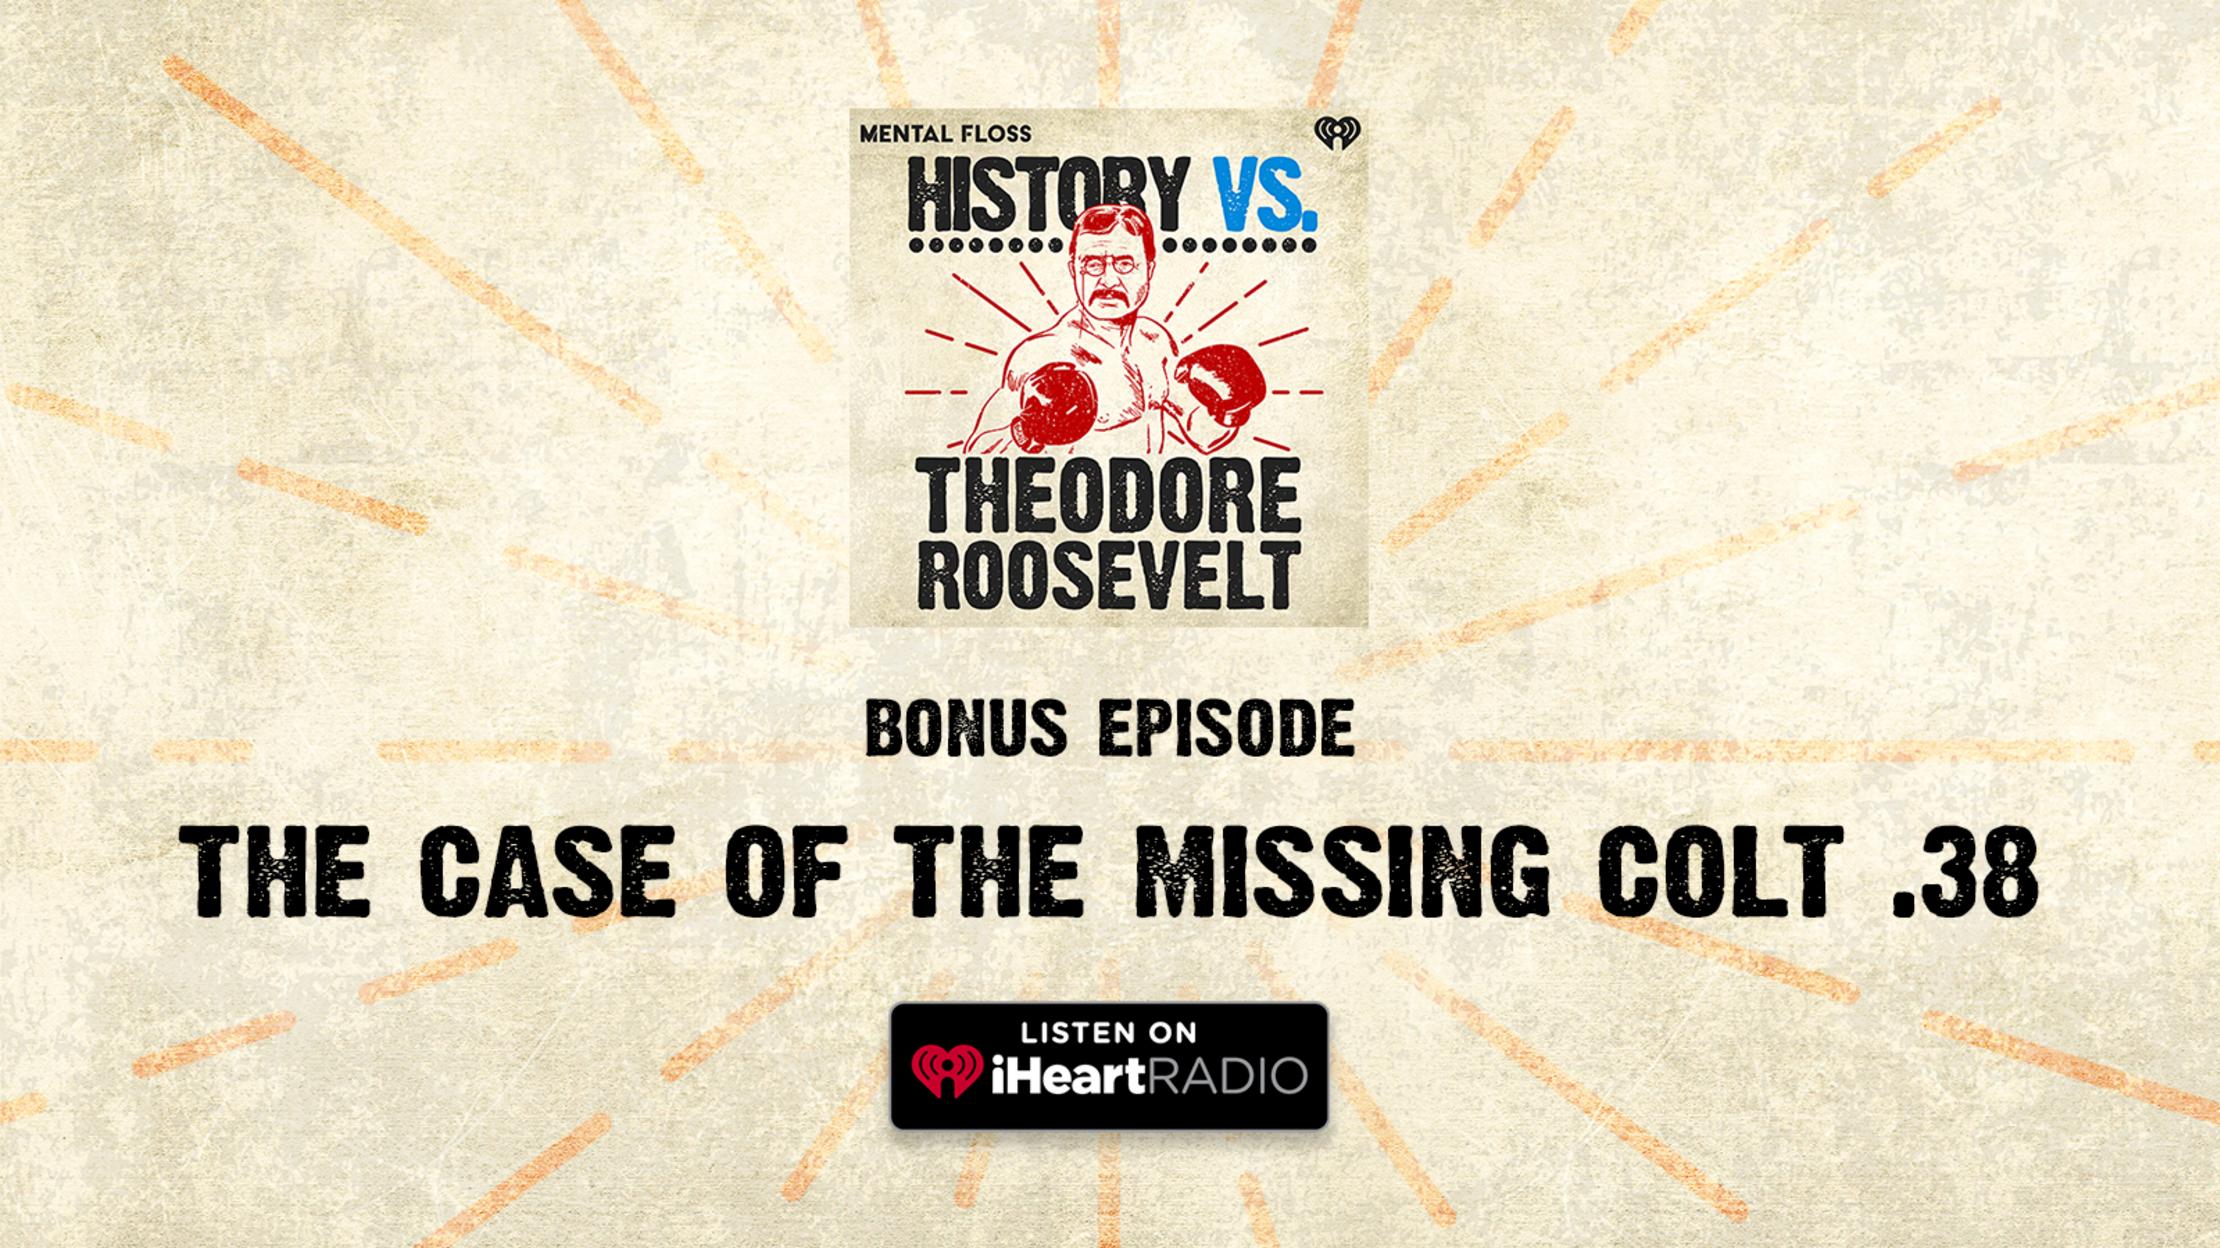 History Vs. Bonus Episode: The Case of the Missing Colt.38